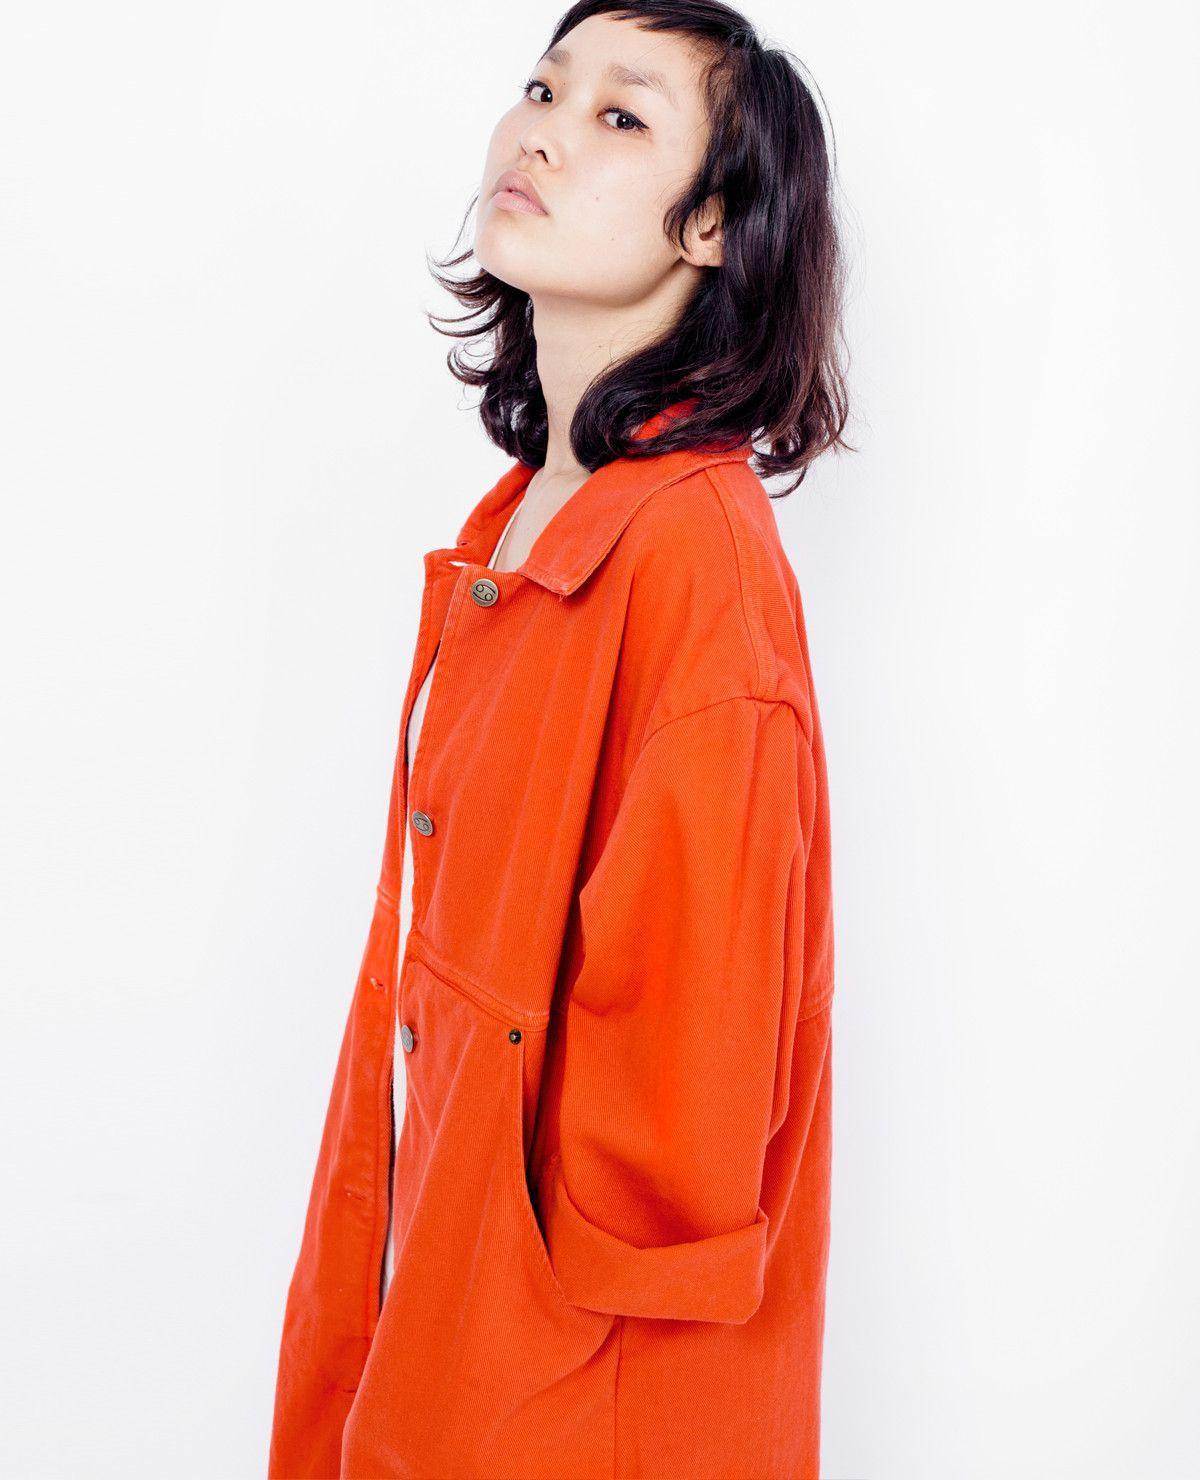 SIXTYNINE Simple Coat / Red Denim